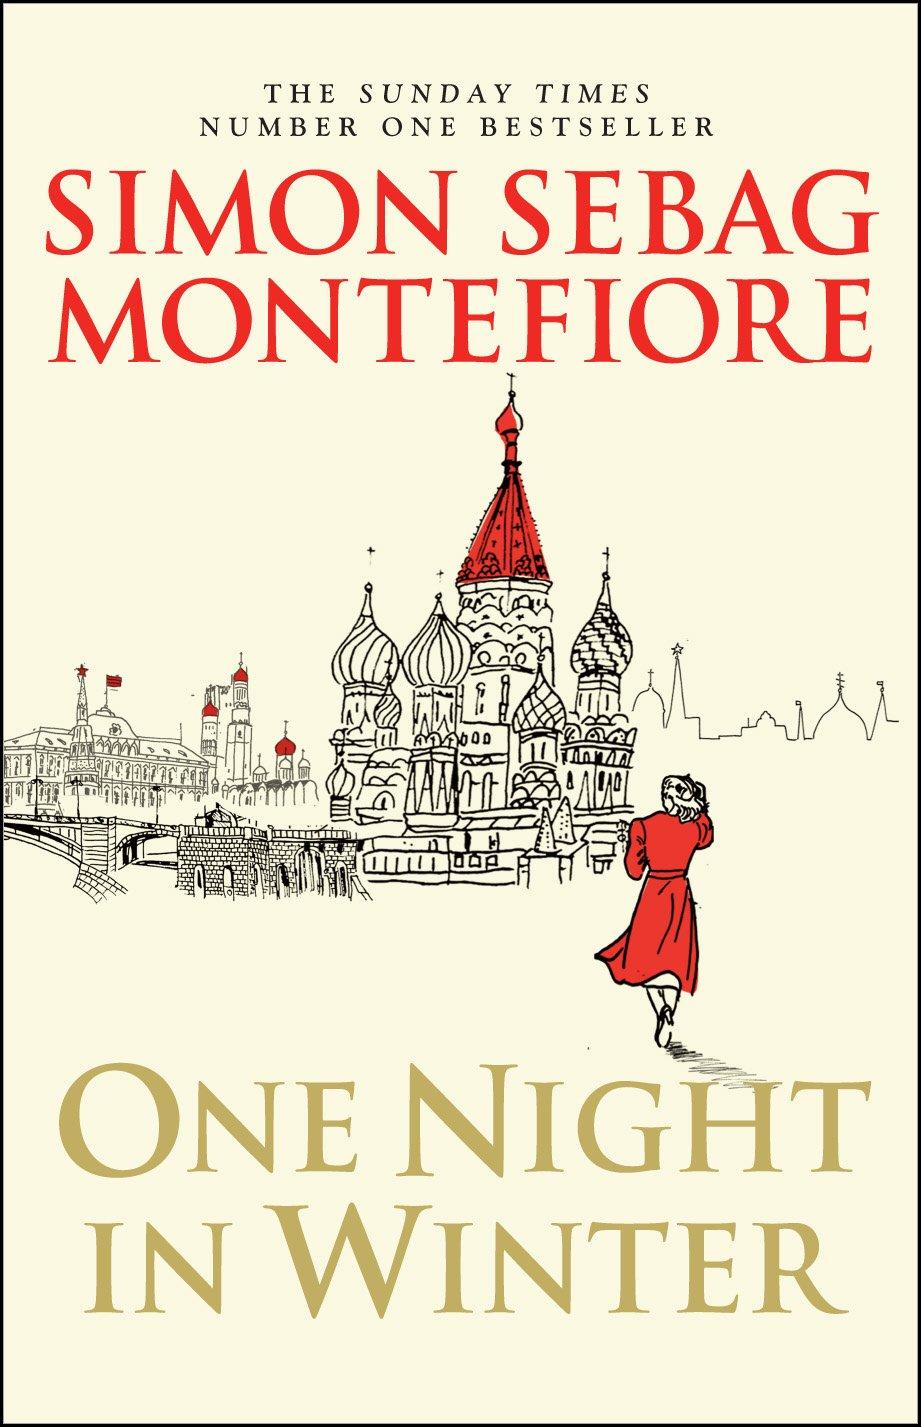 Novel Of The Week - One Night in Winter by Simon Sebag Montefiore